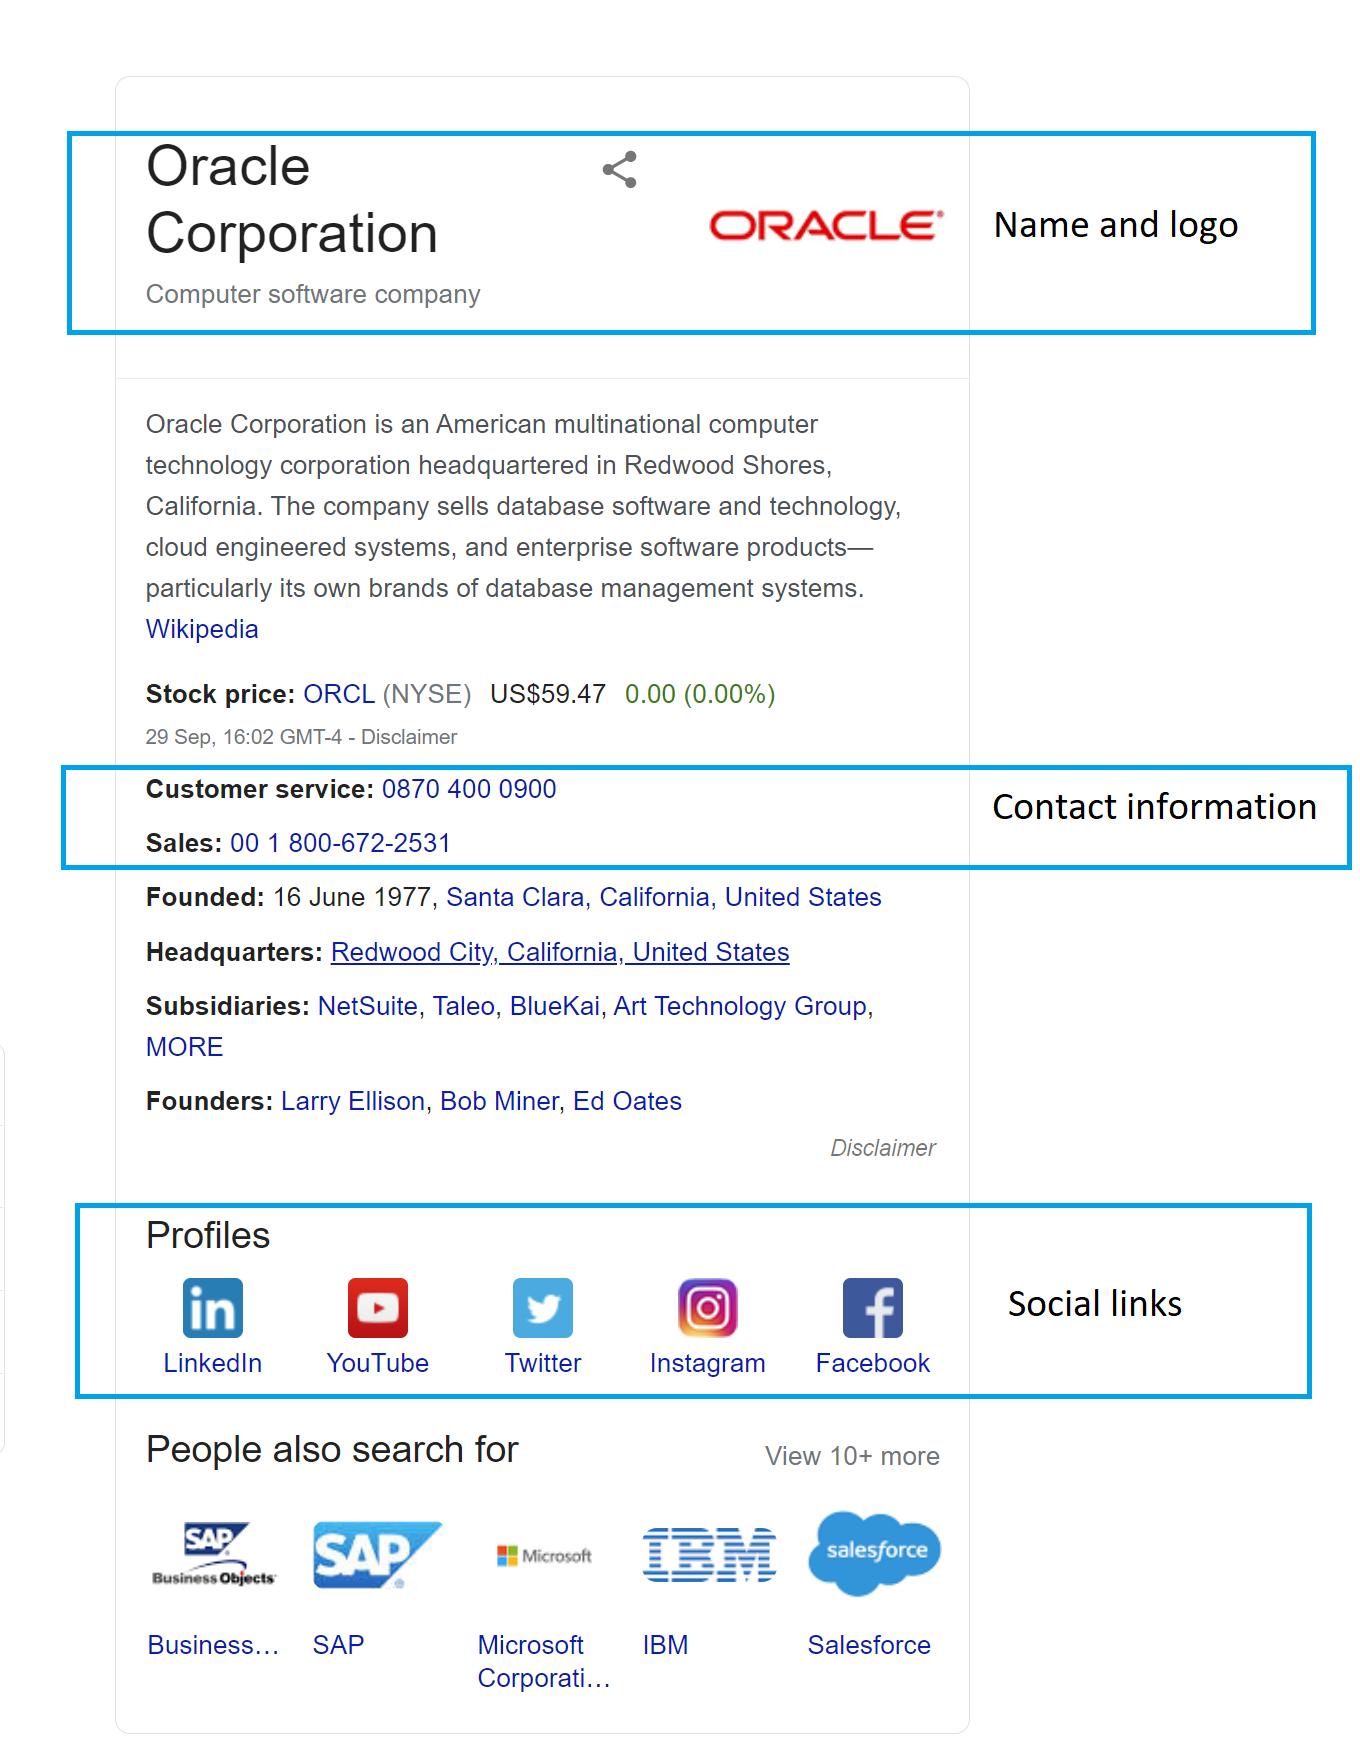 Organisation schema markup example - Oracle Corporation